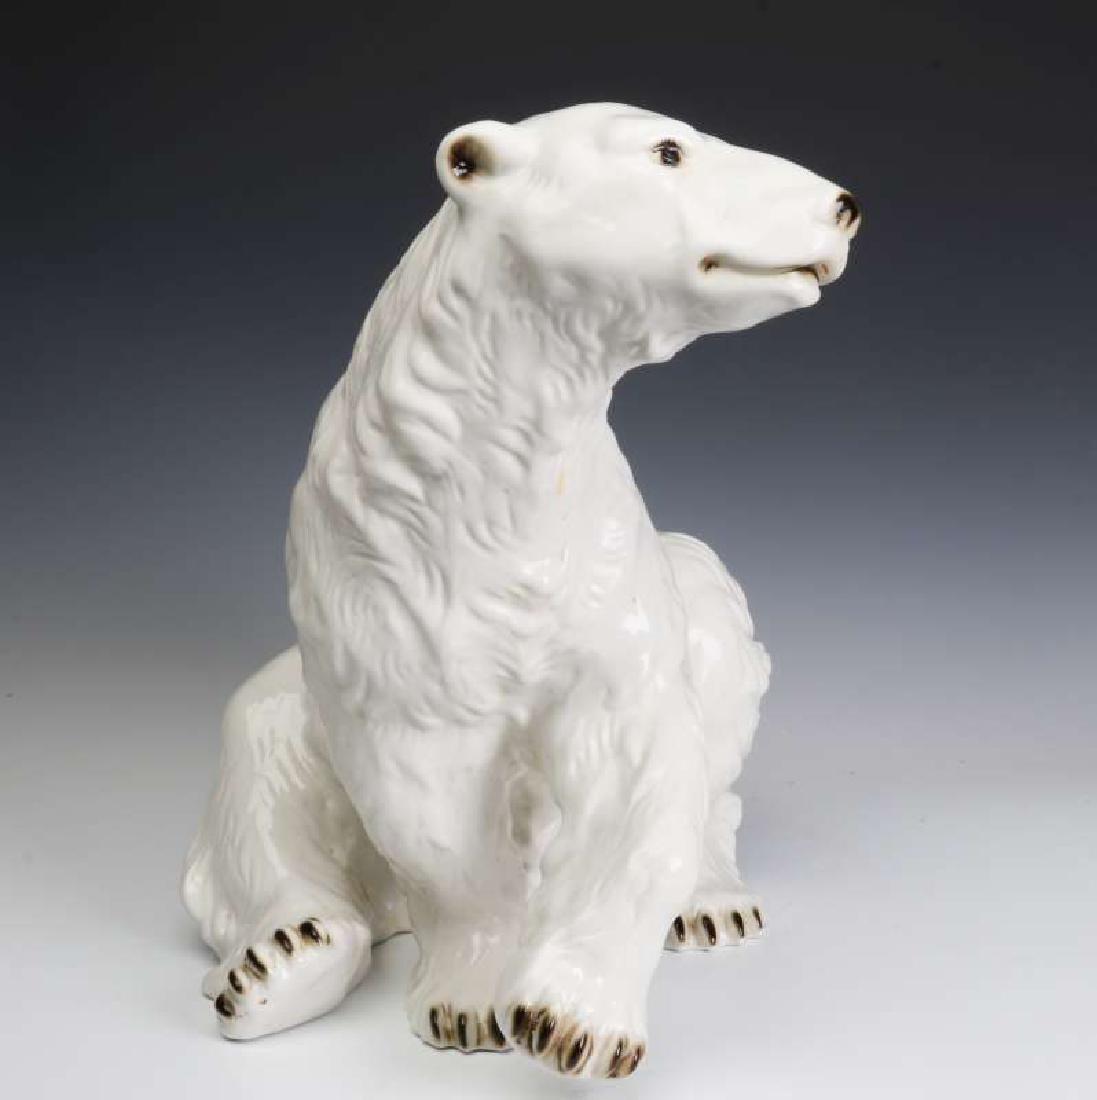 A VERY LARGE POLAR BEAR FIGURE SIGNED ROYAL DUX - 6